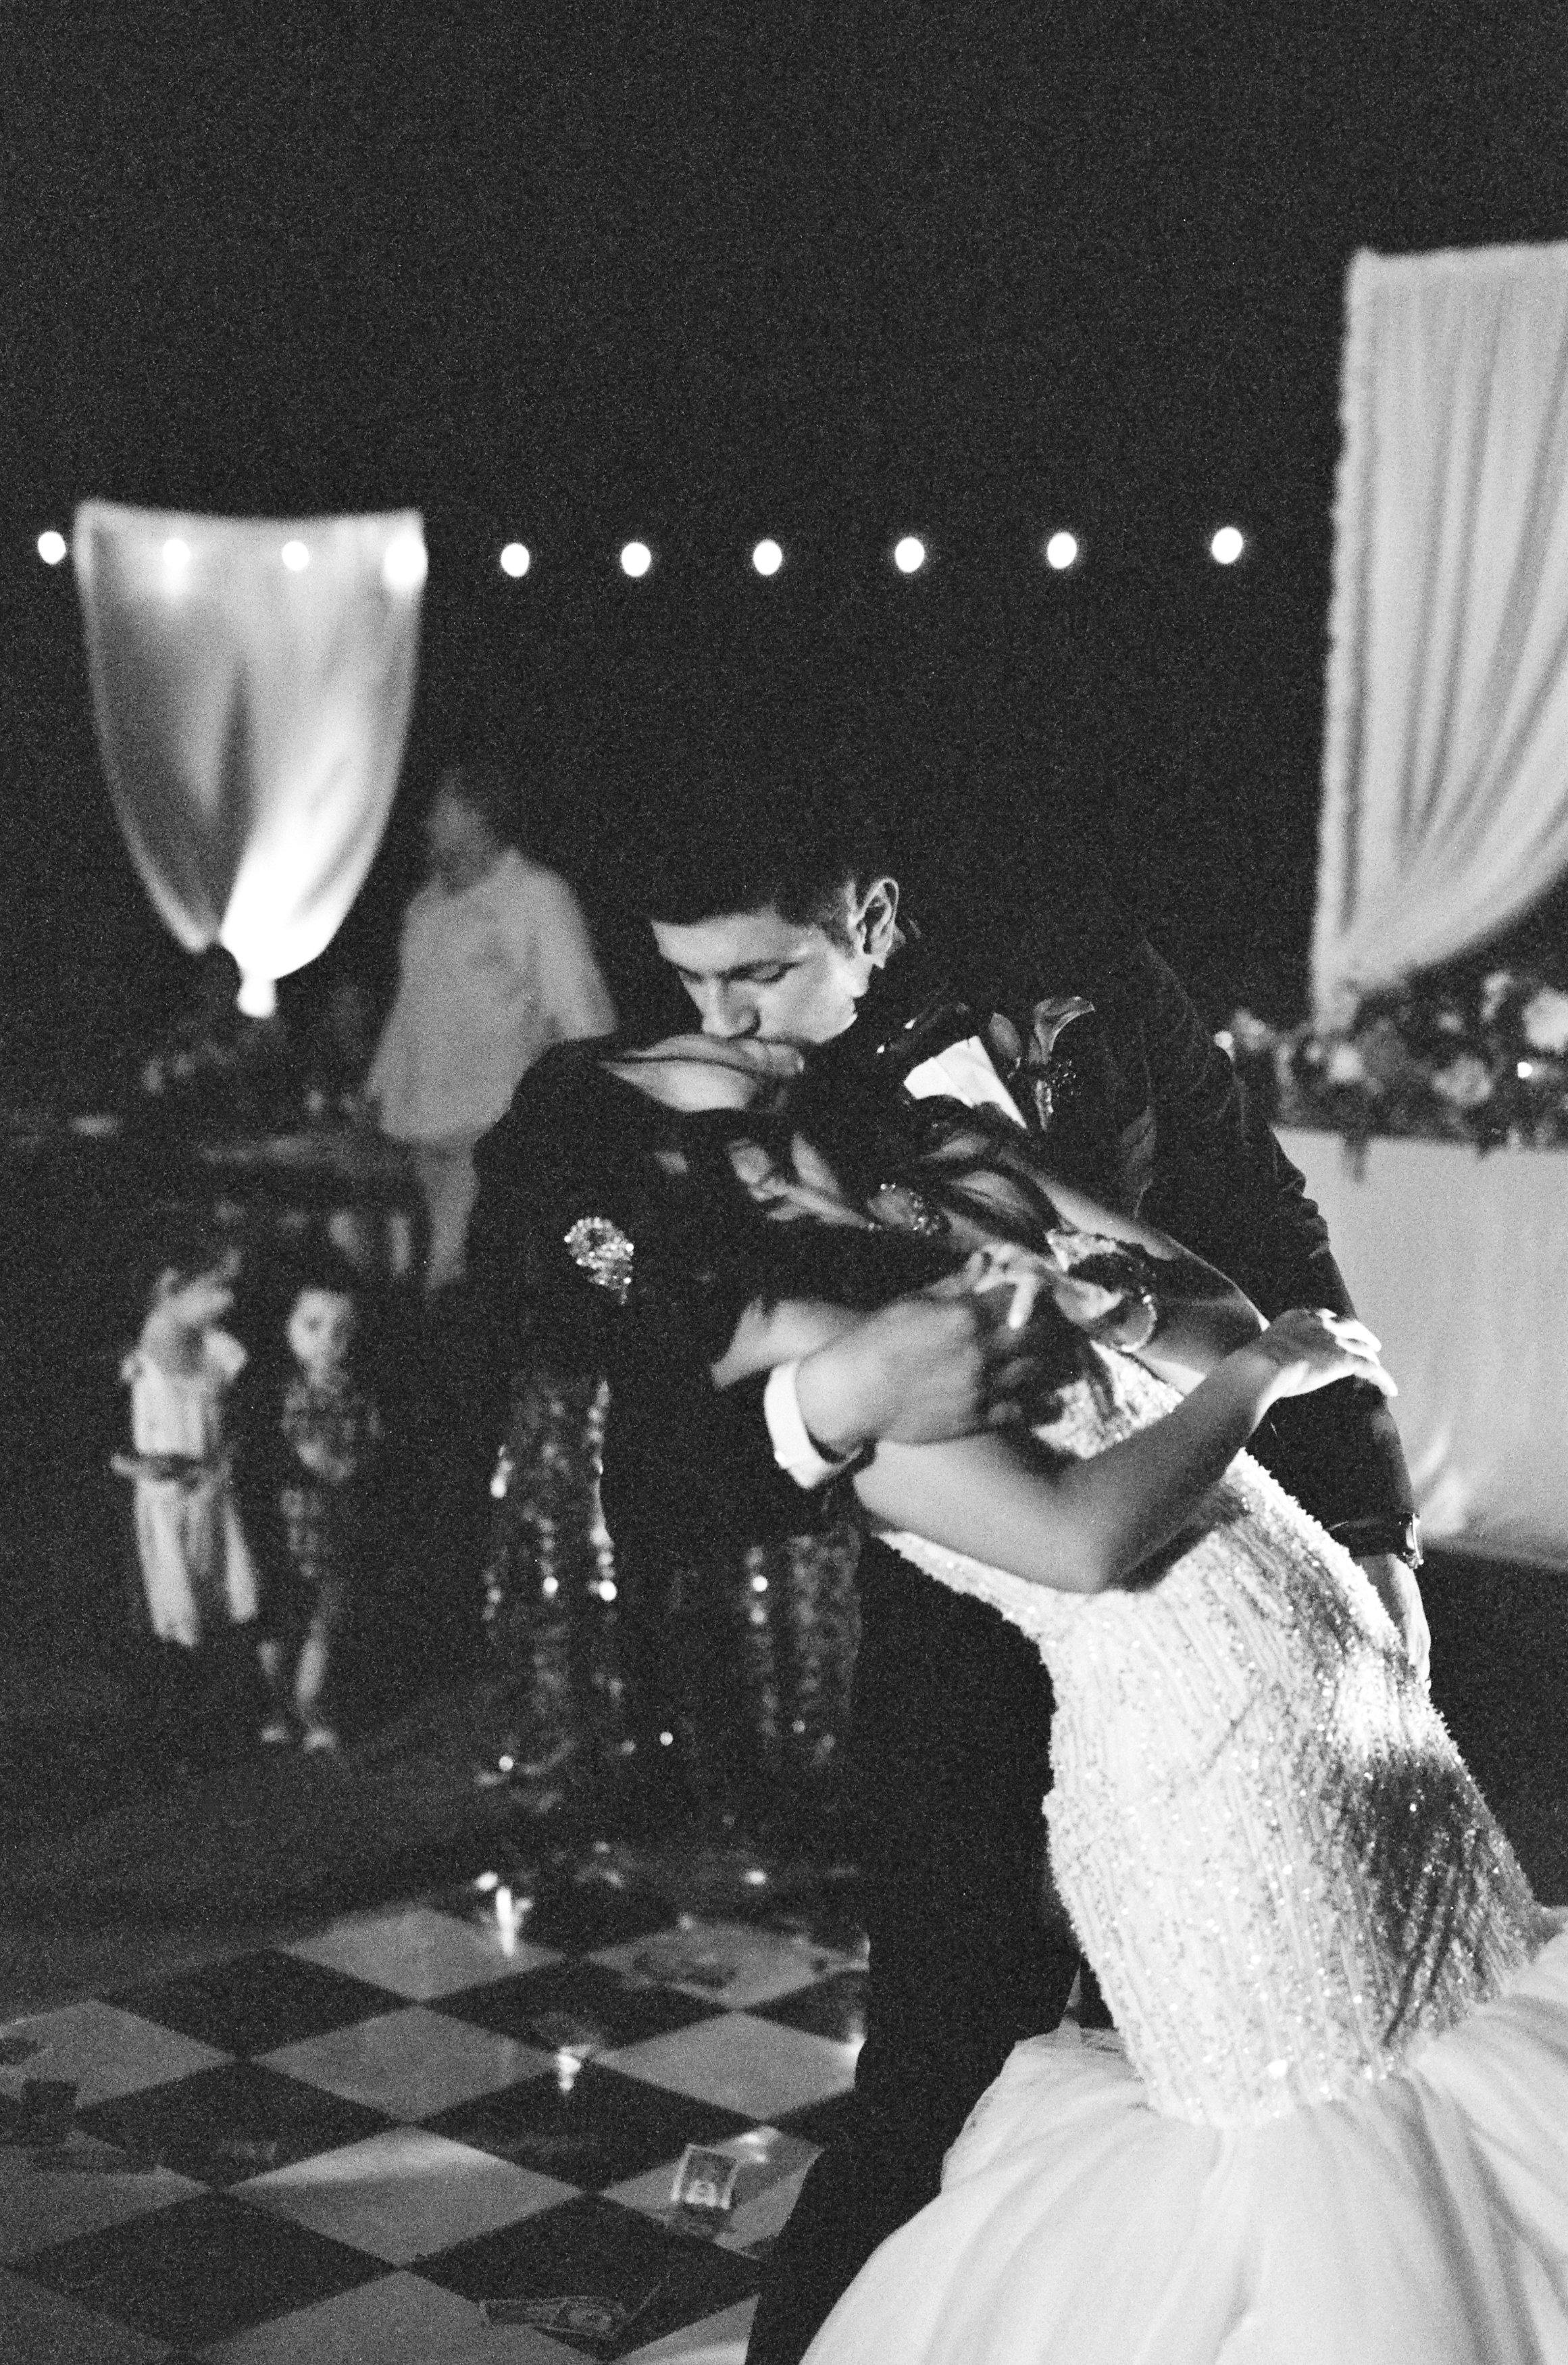 Amador_County_Wedding_Bride_Groom_Kiss_Dance_Lights_Black_White_Rancho_Victoria_Vineyard_Northern_California.jpg